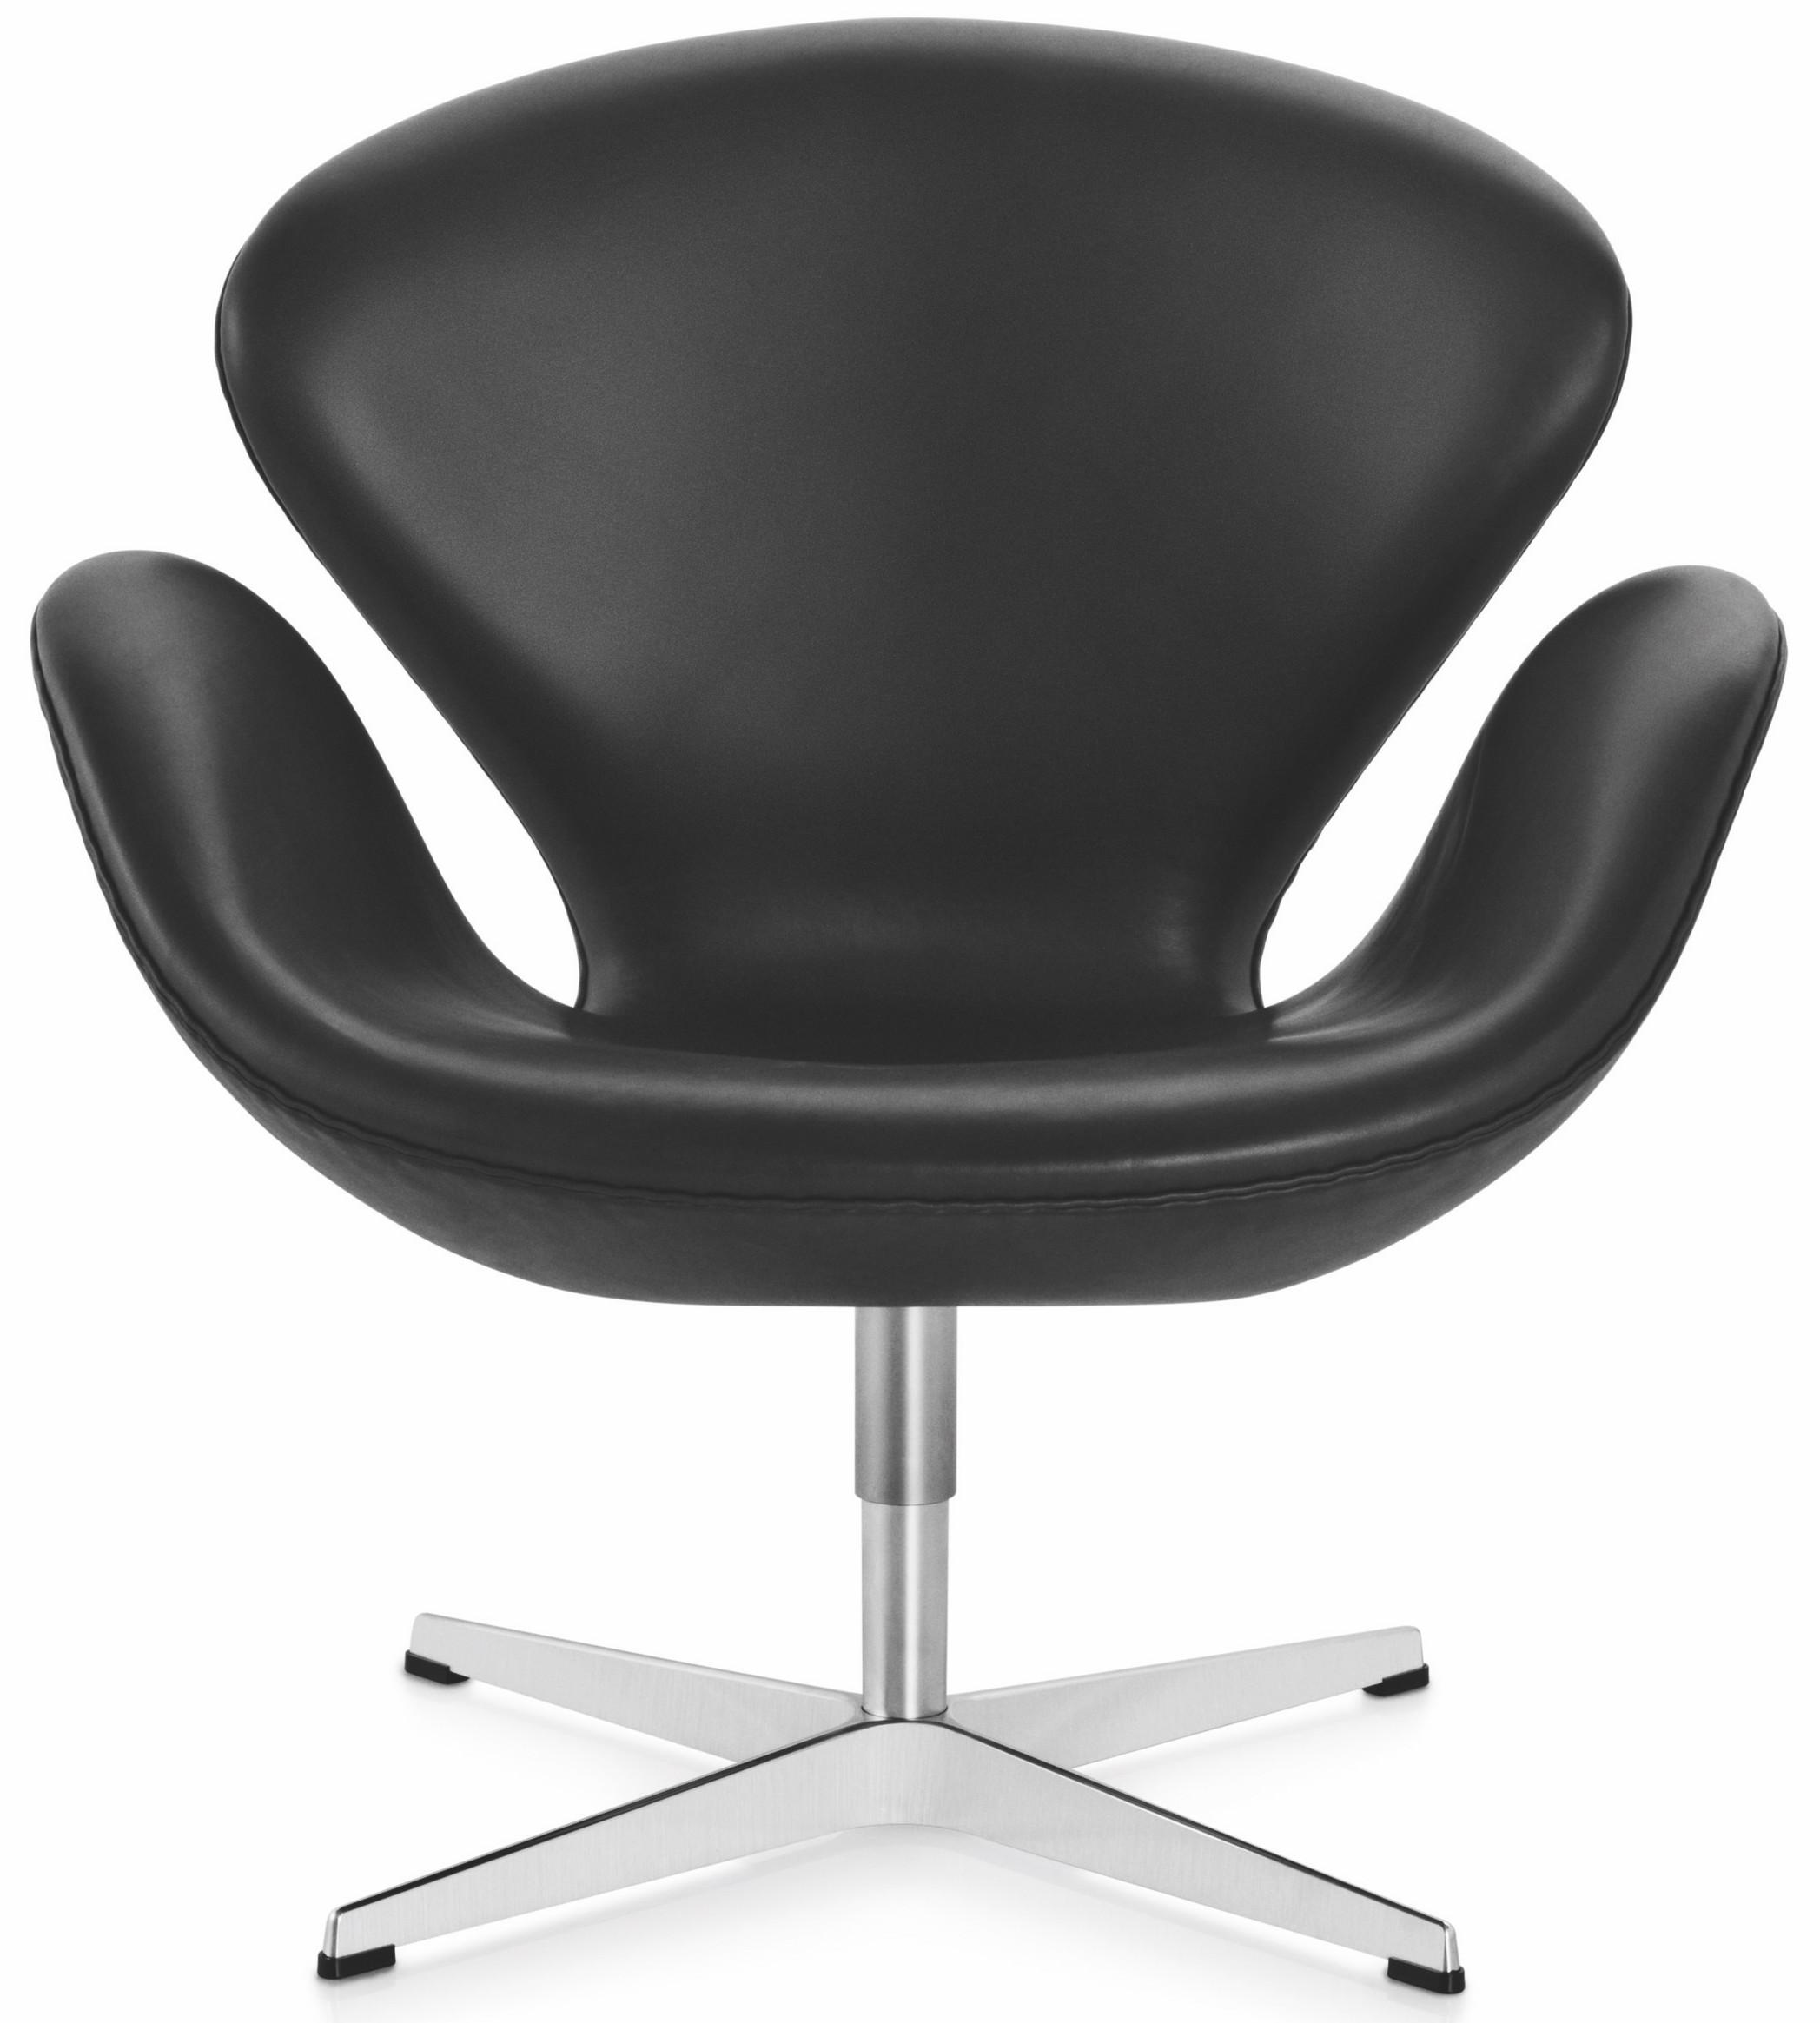 fritz hansen fauteuil swan design arne jacobsen. Black Bedroom Furniture Sets. Home Design Ideas